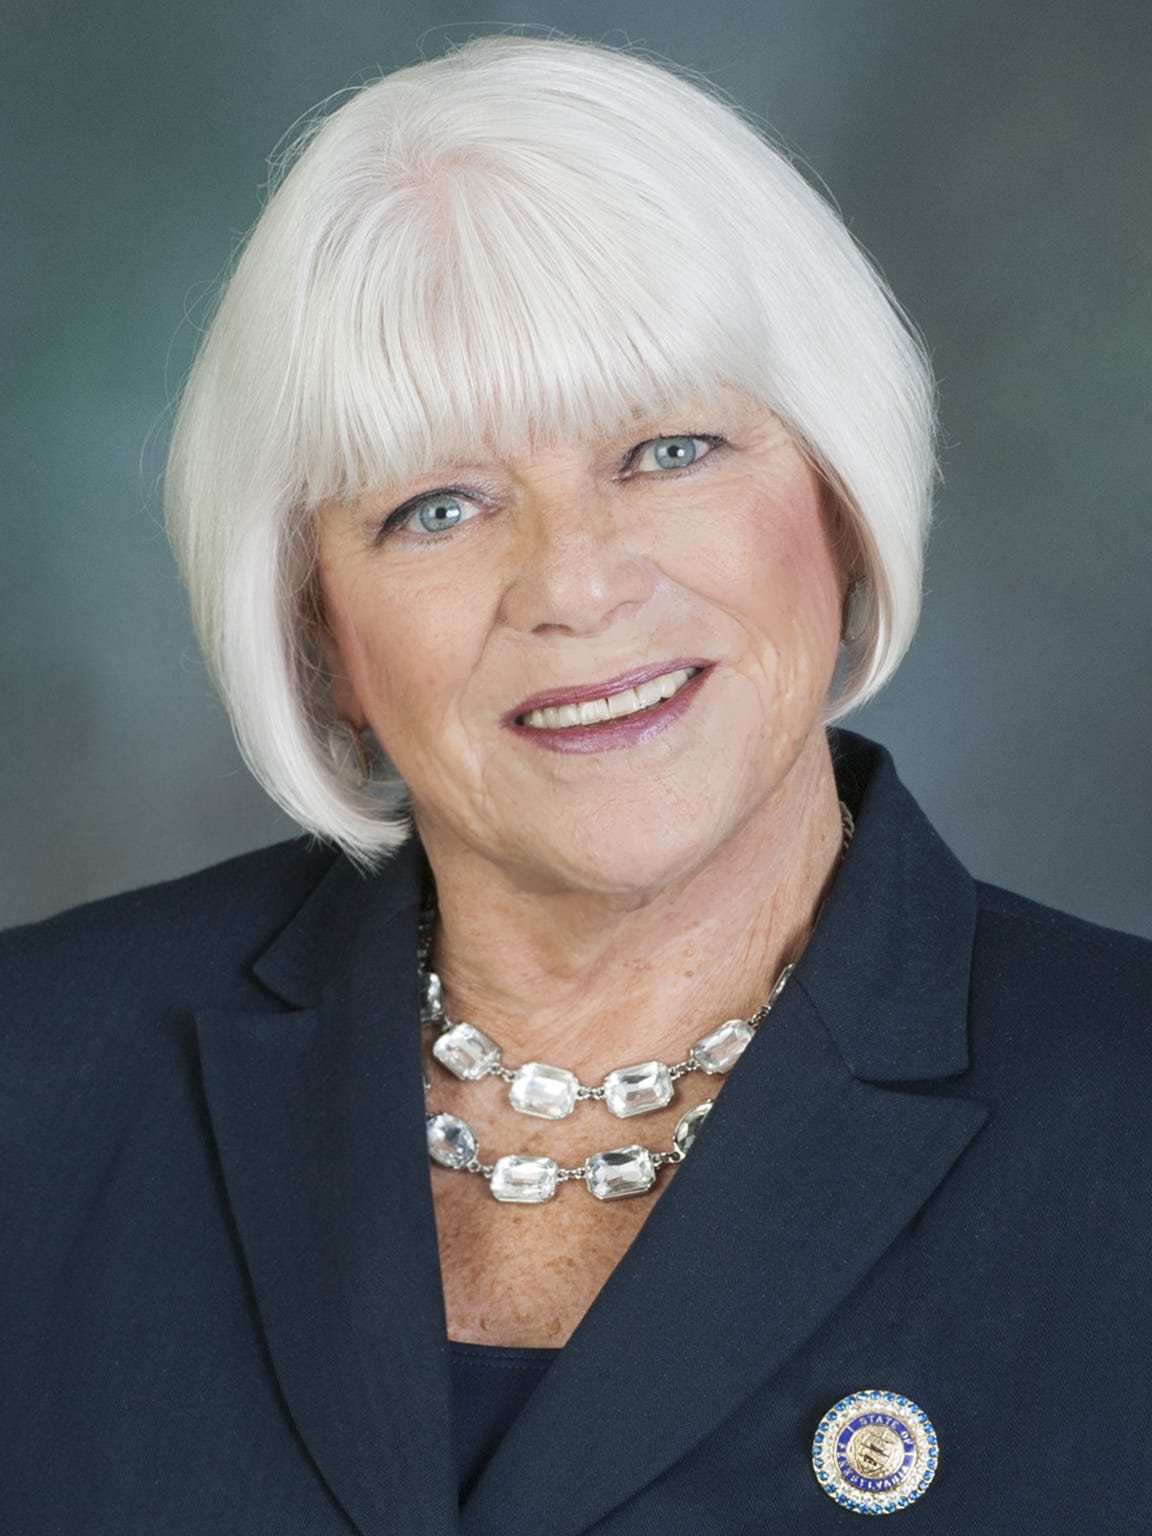 PA Rep. Mauree Gingrich (R-101)